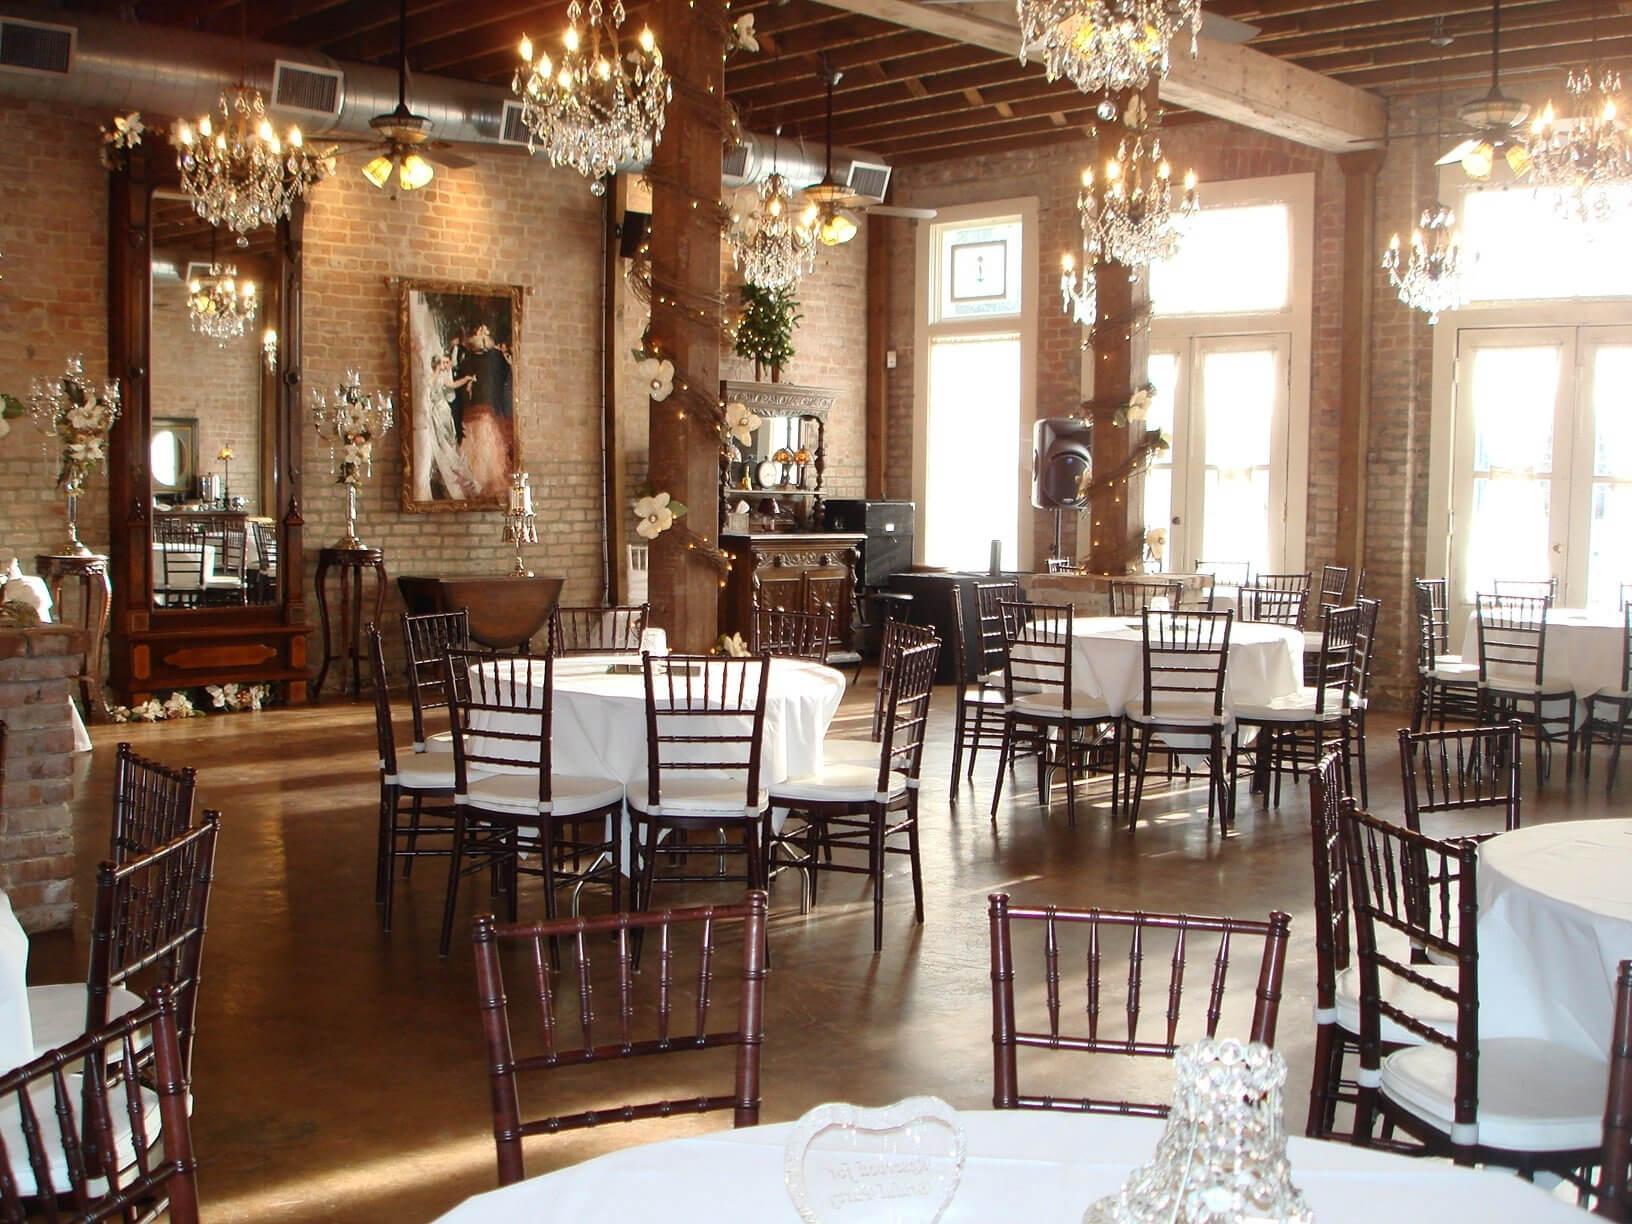 Butler's Courtyard - Venues - Weddings in Houston